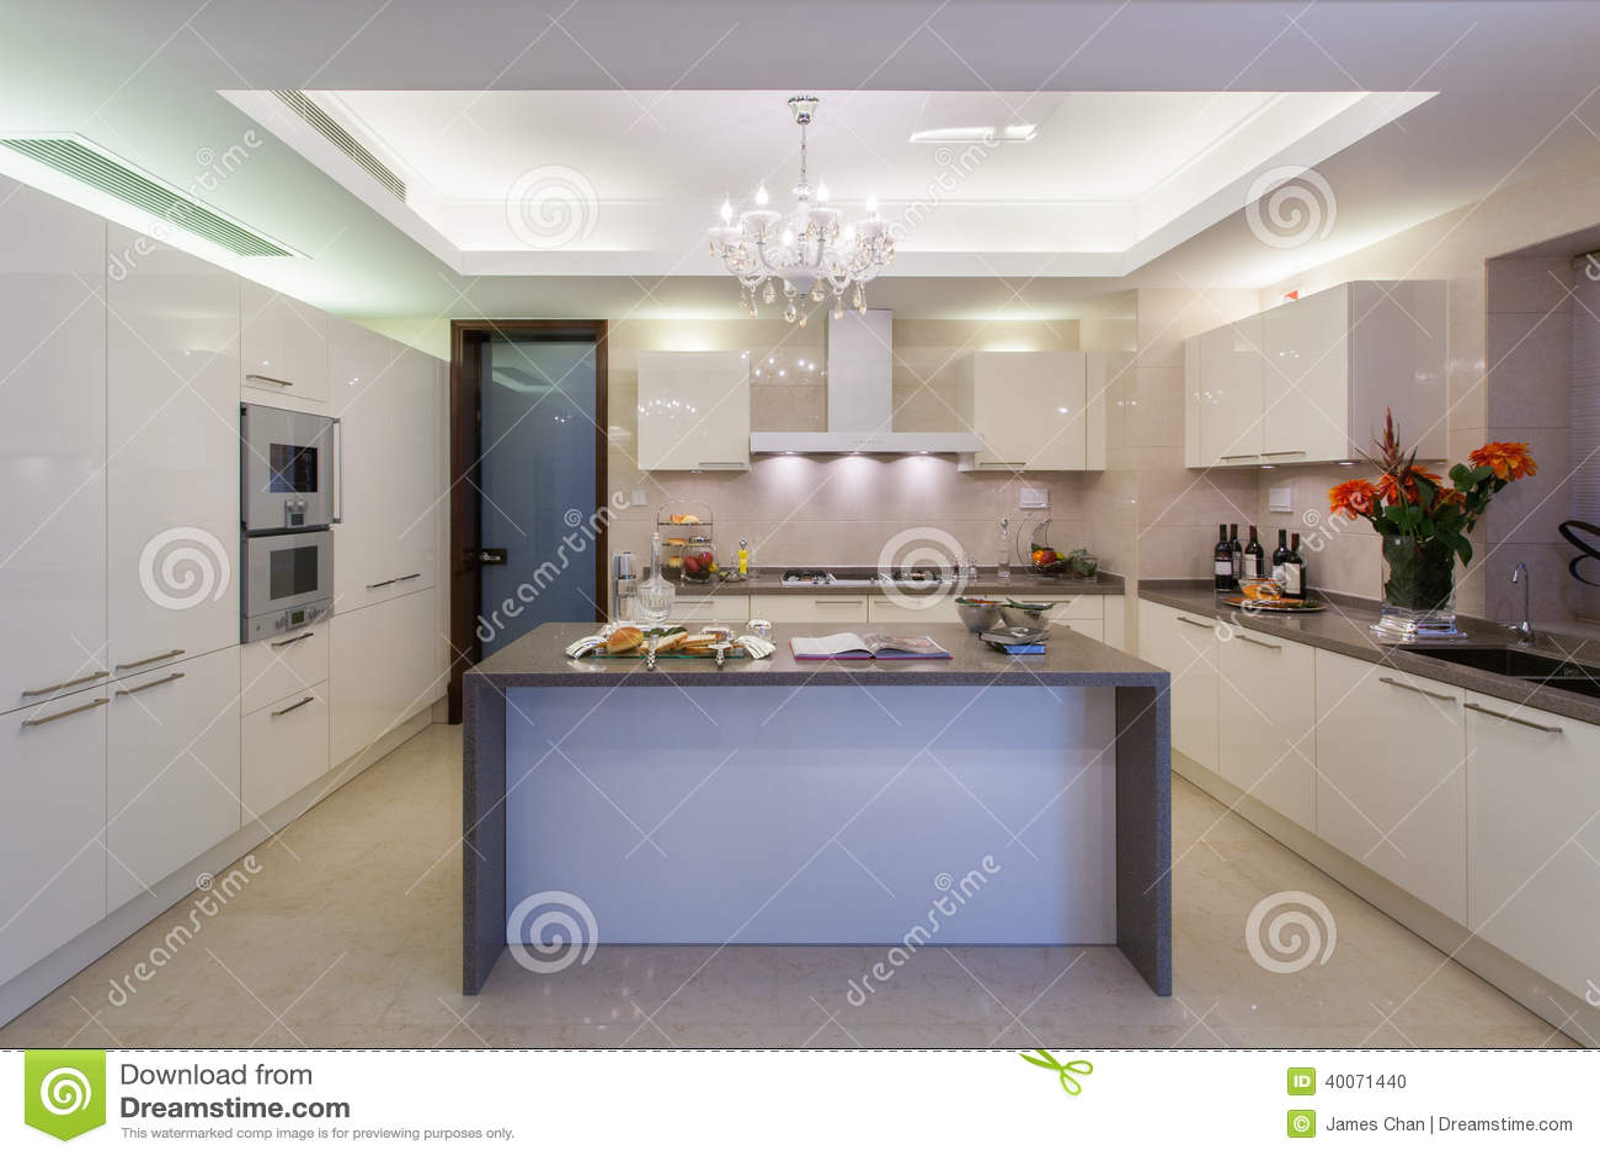 Pulisca La Cucina Moderna Bianca Fotografia Stock - Immagine ...